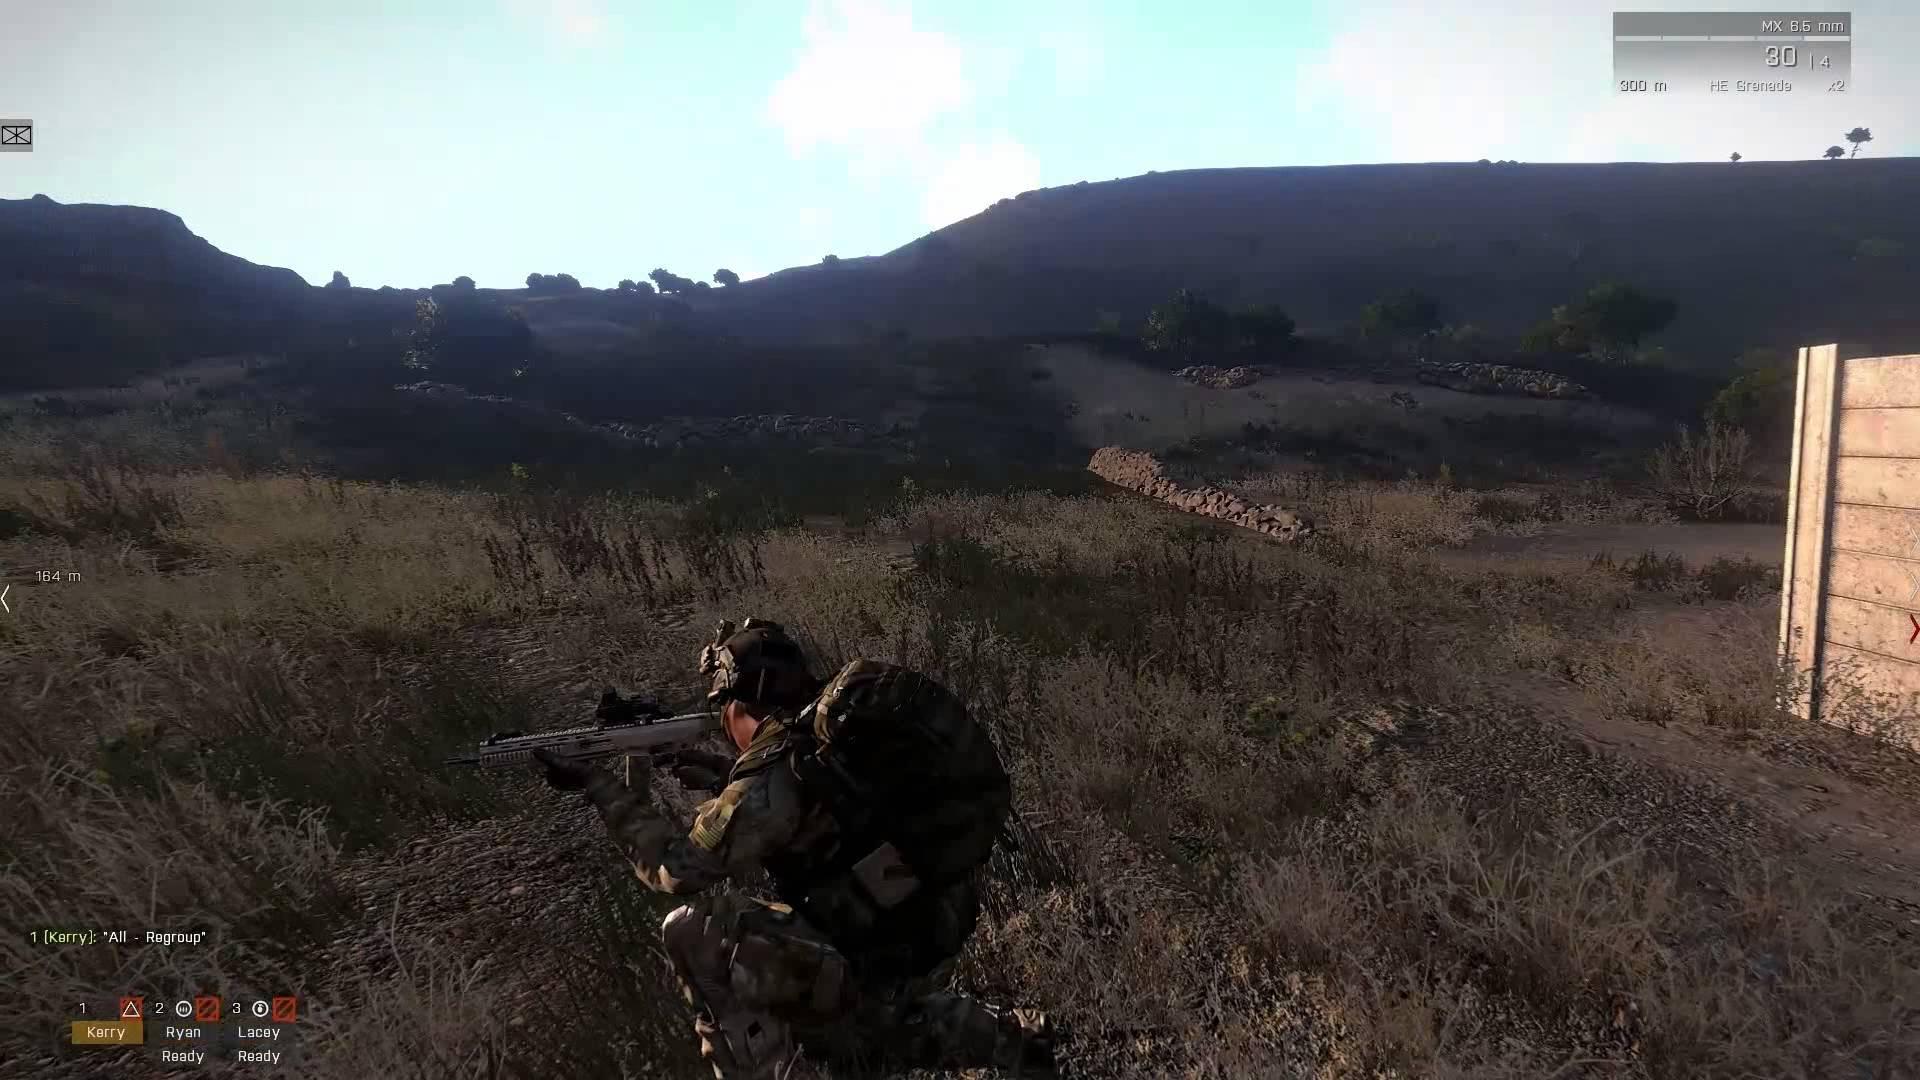 Armed Assault 3 Malden Servers, ARMA3 Malden Servers - June 2019